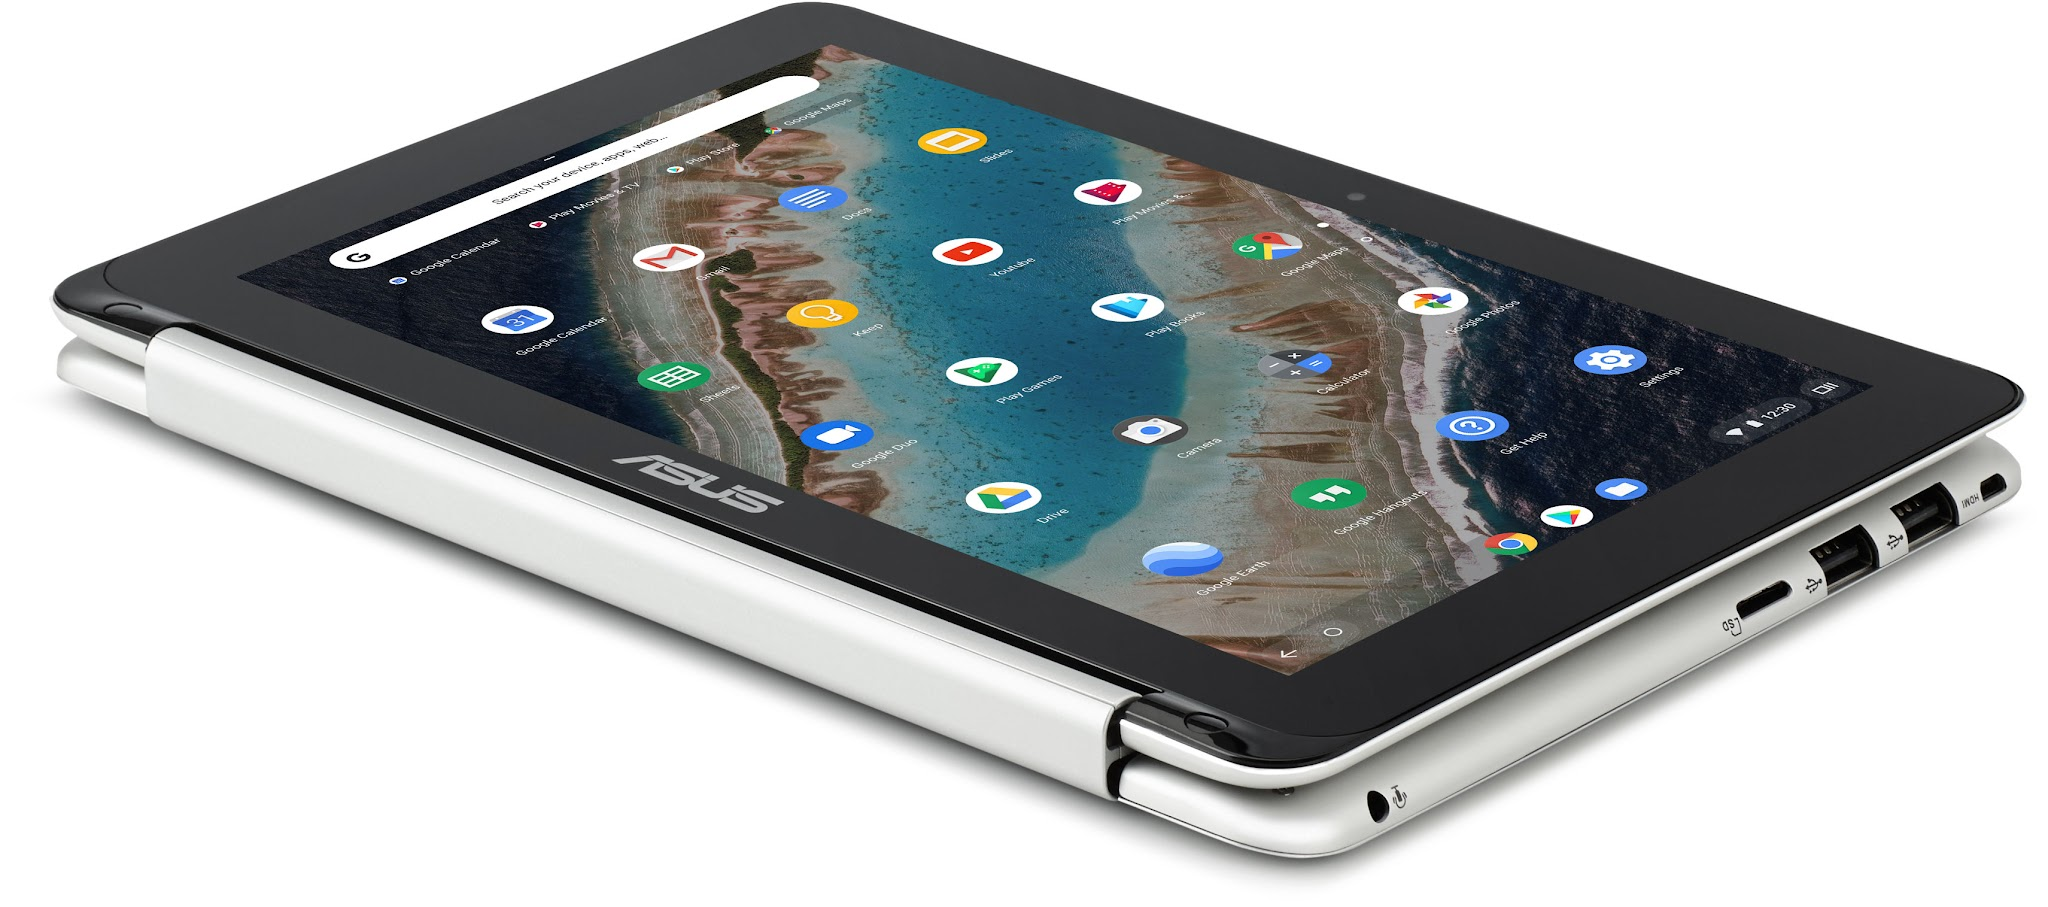 ASUS Chromebook Flip C101 PA - photo 3